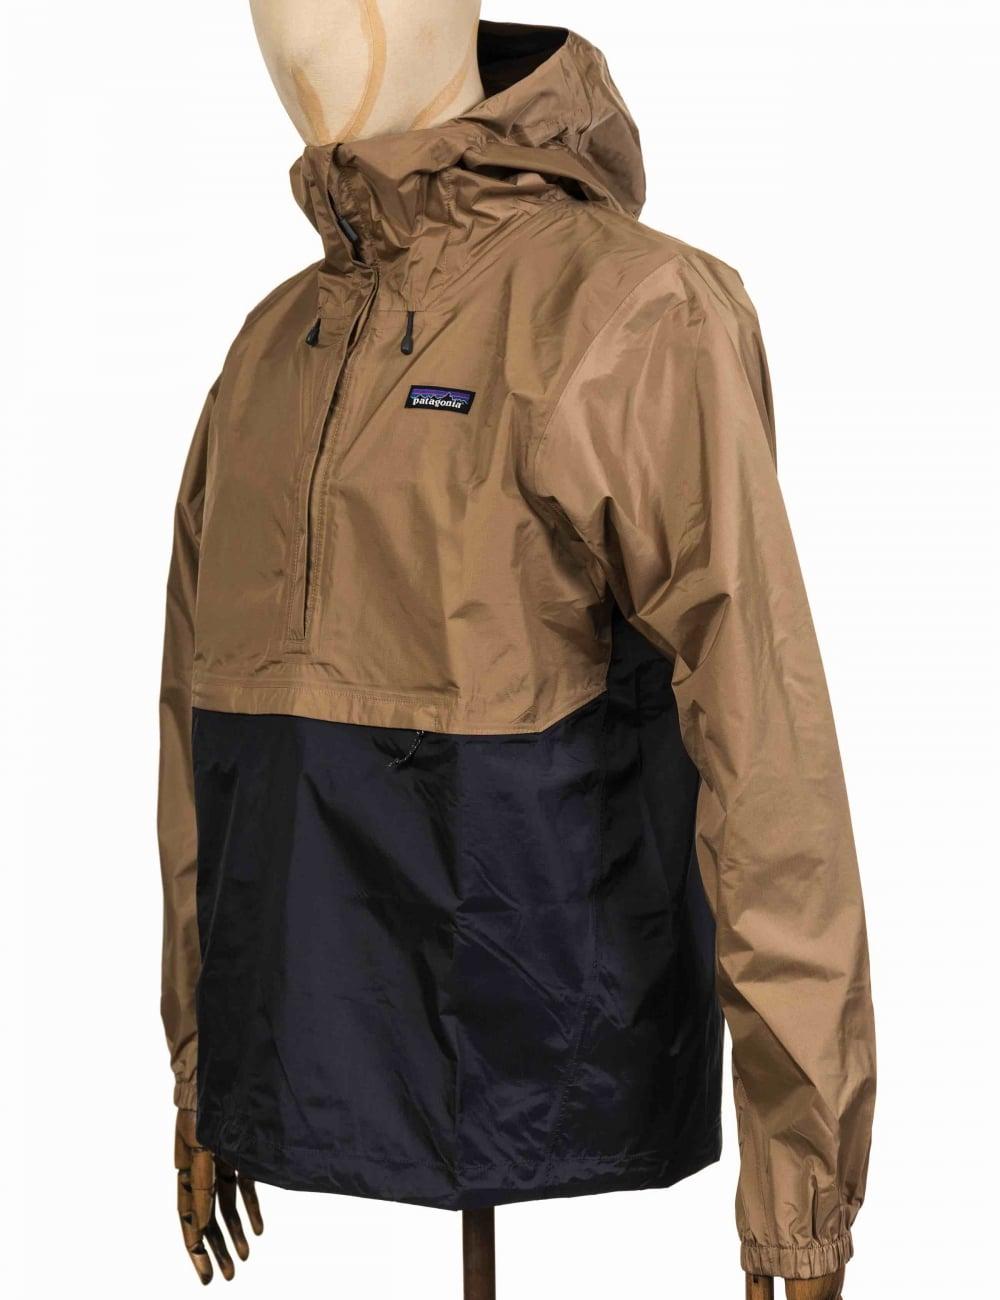 Patagonia Torrentshell Pullover Jacket - Mojave Khaki - Clothing ...